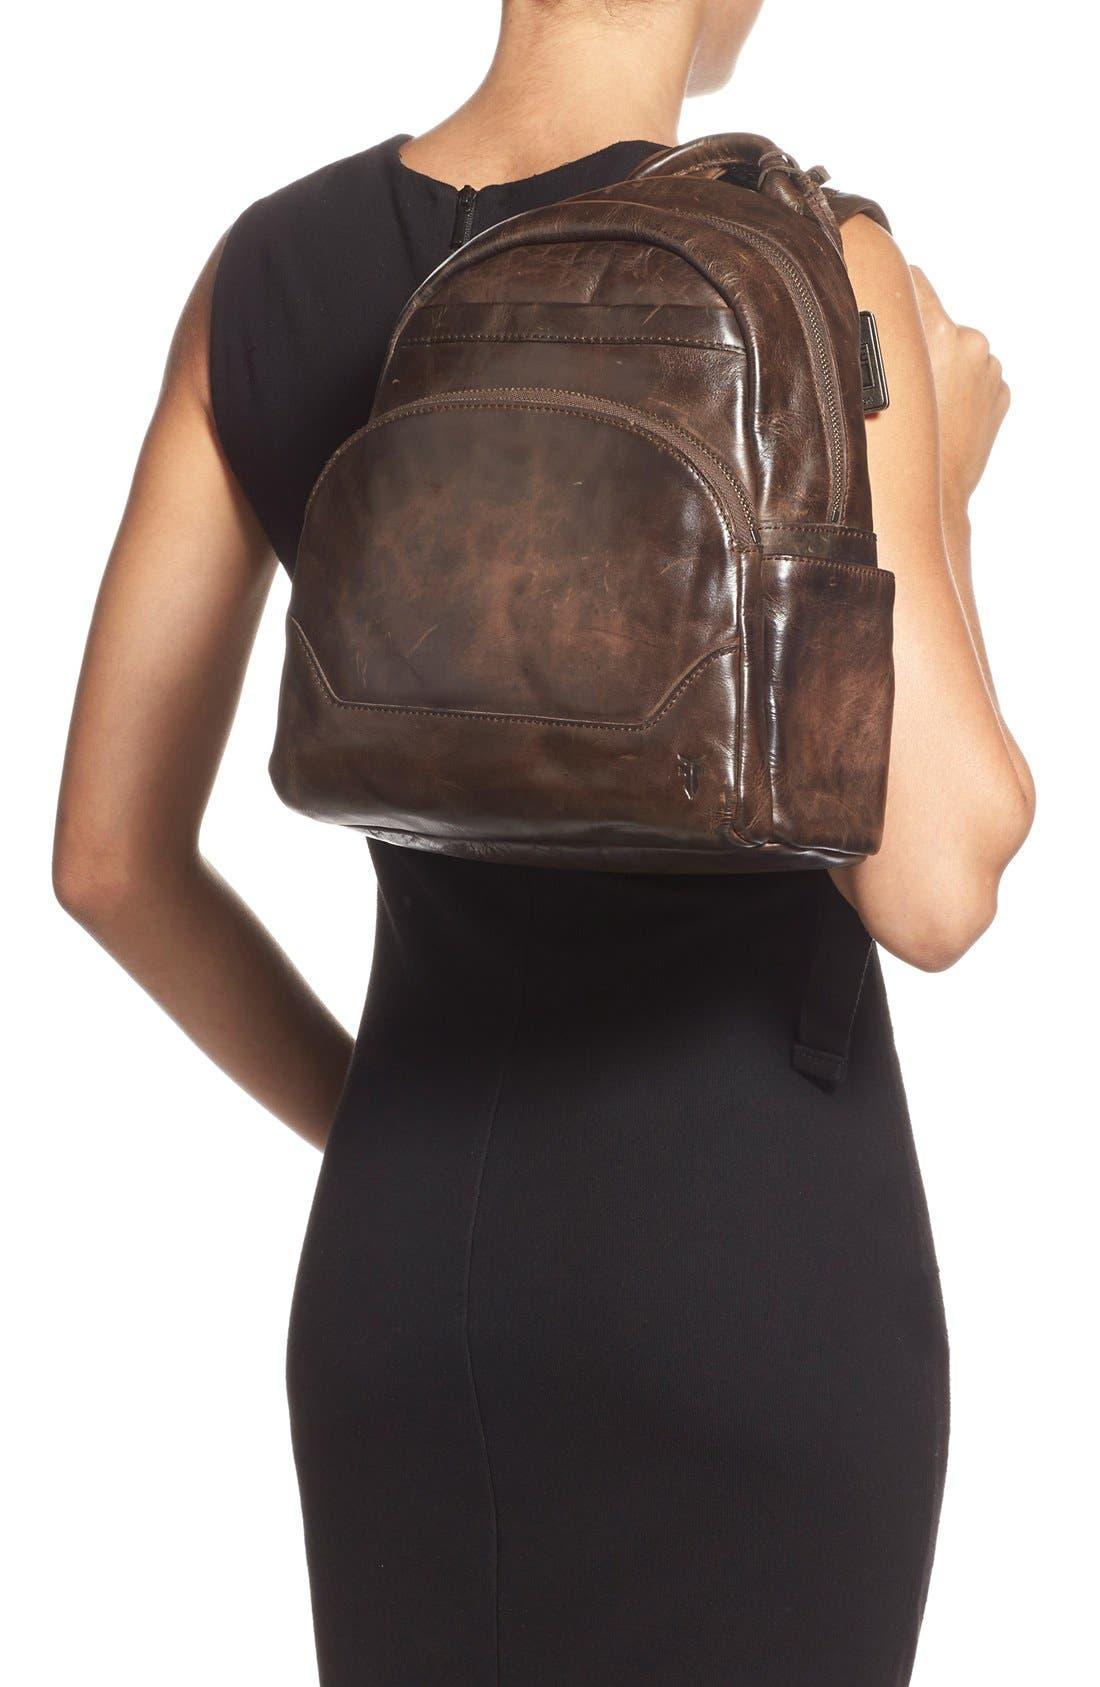 FRYE,                             'Melissa' Backpack,                             Alternate thumbnail 2, color,                             020